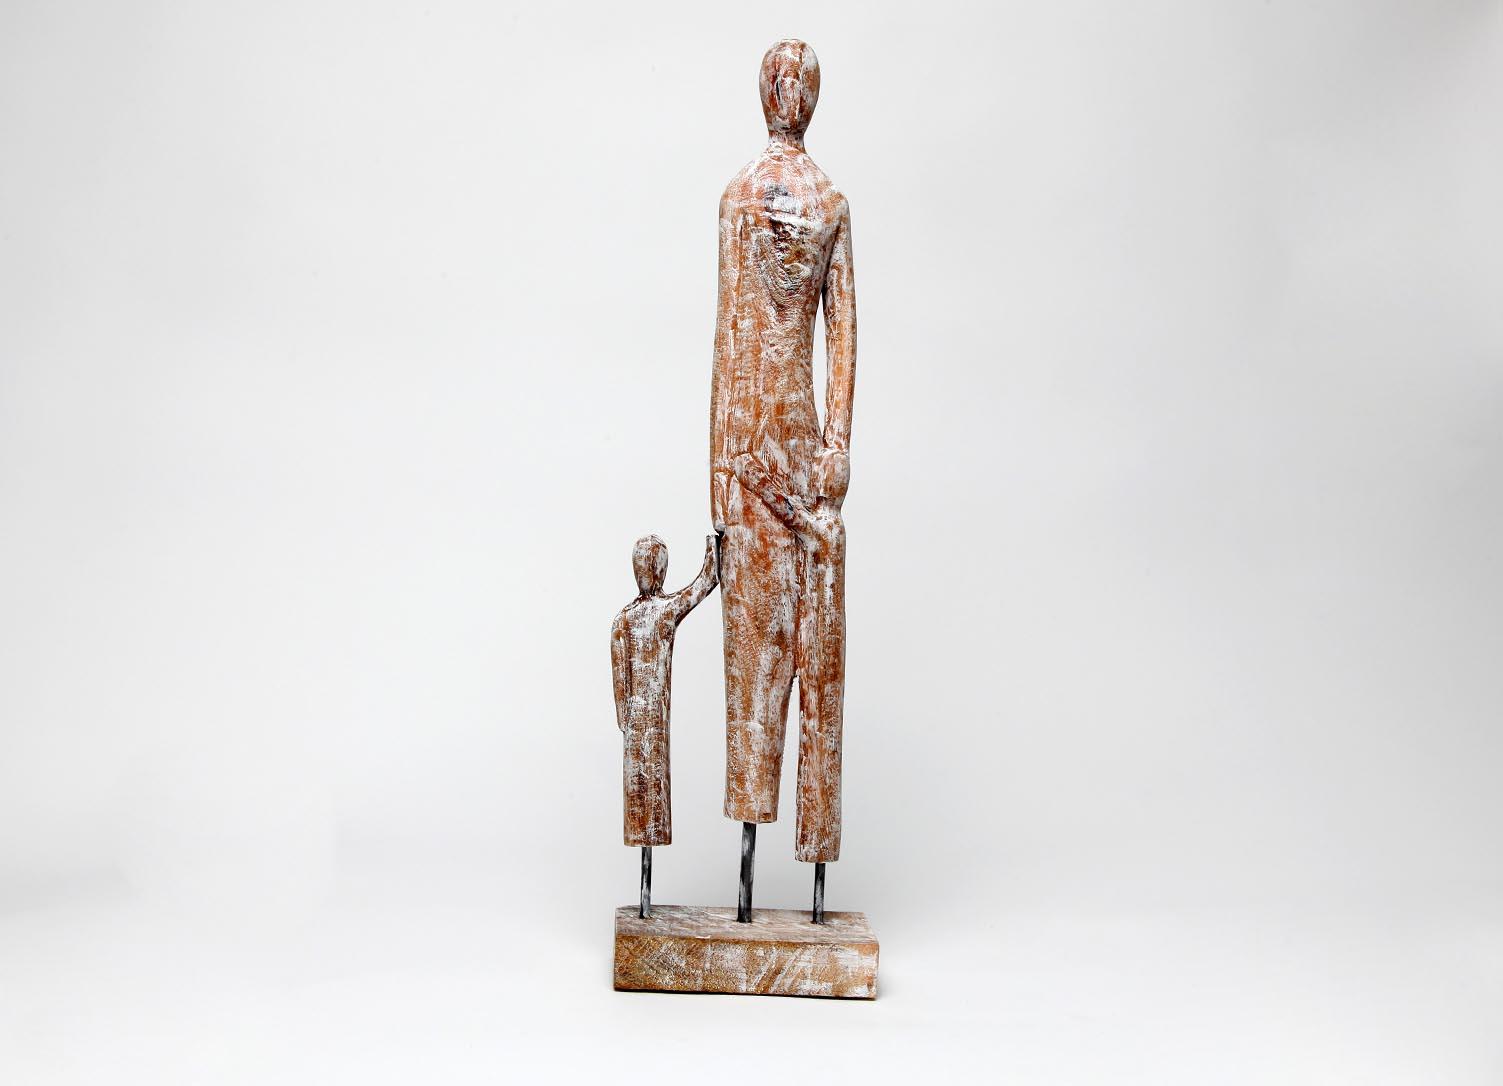 Exner Skulptur Familie Artisanal Figur Dekofigur 55 x15 cm Holzfigur